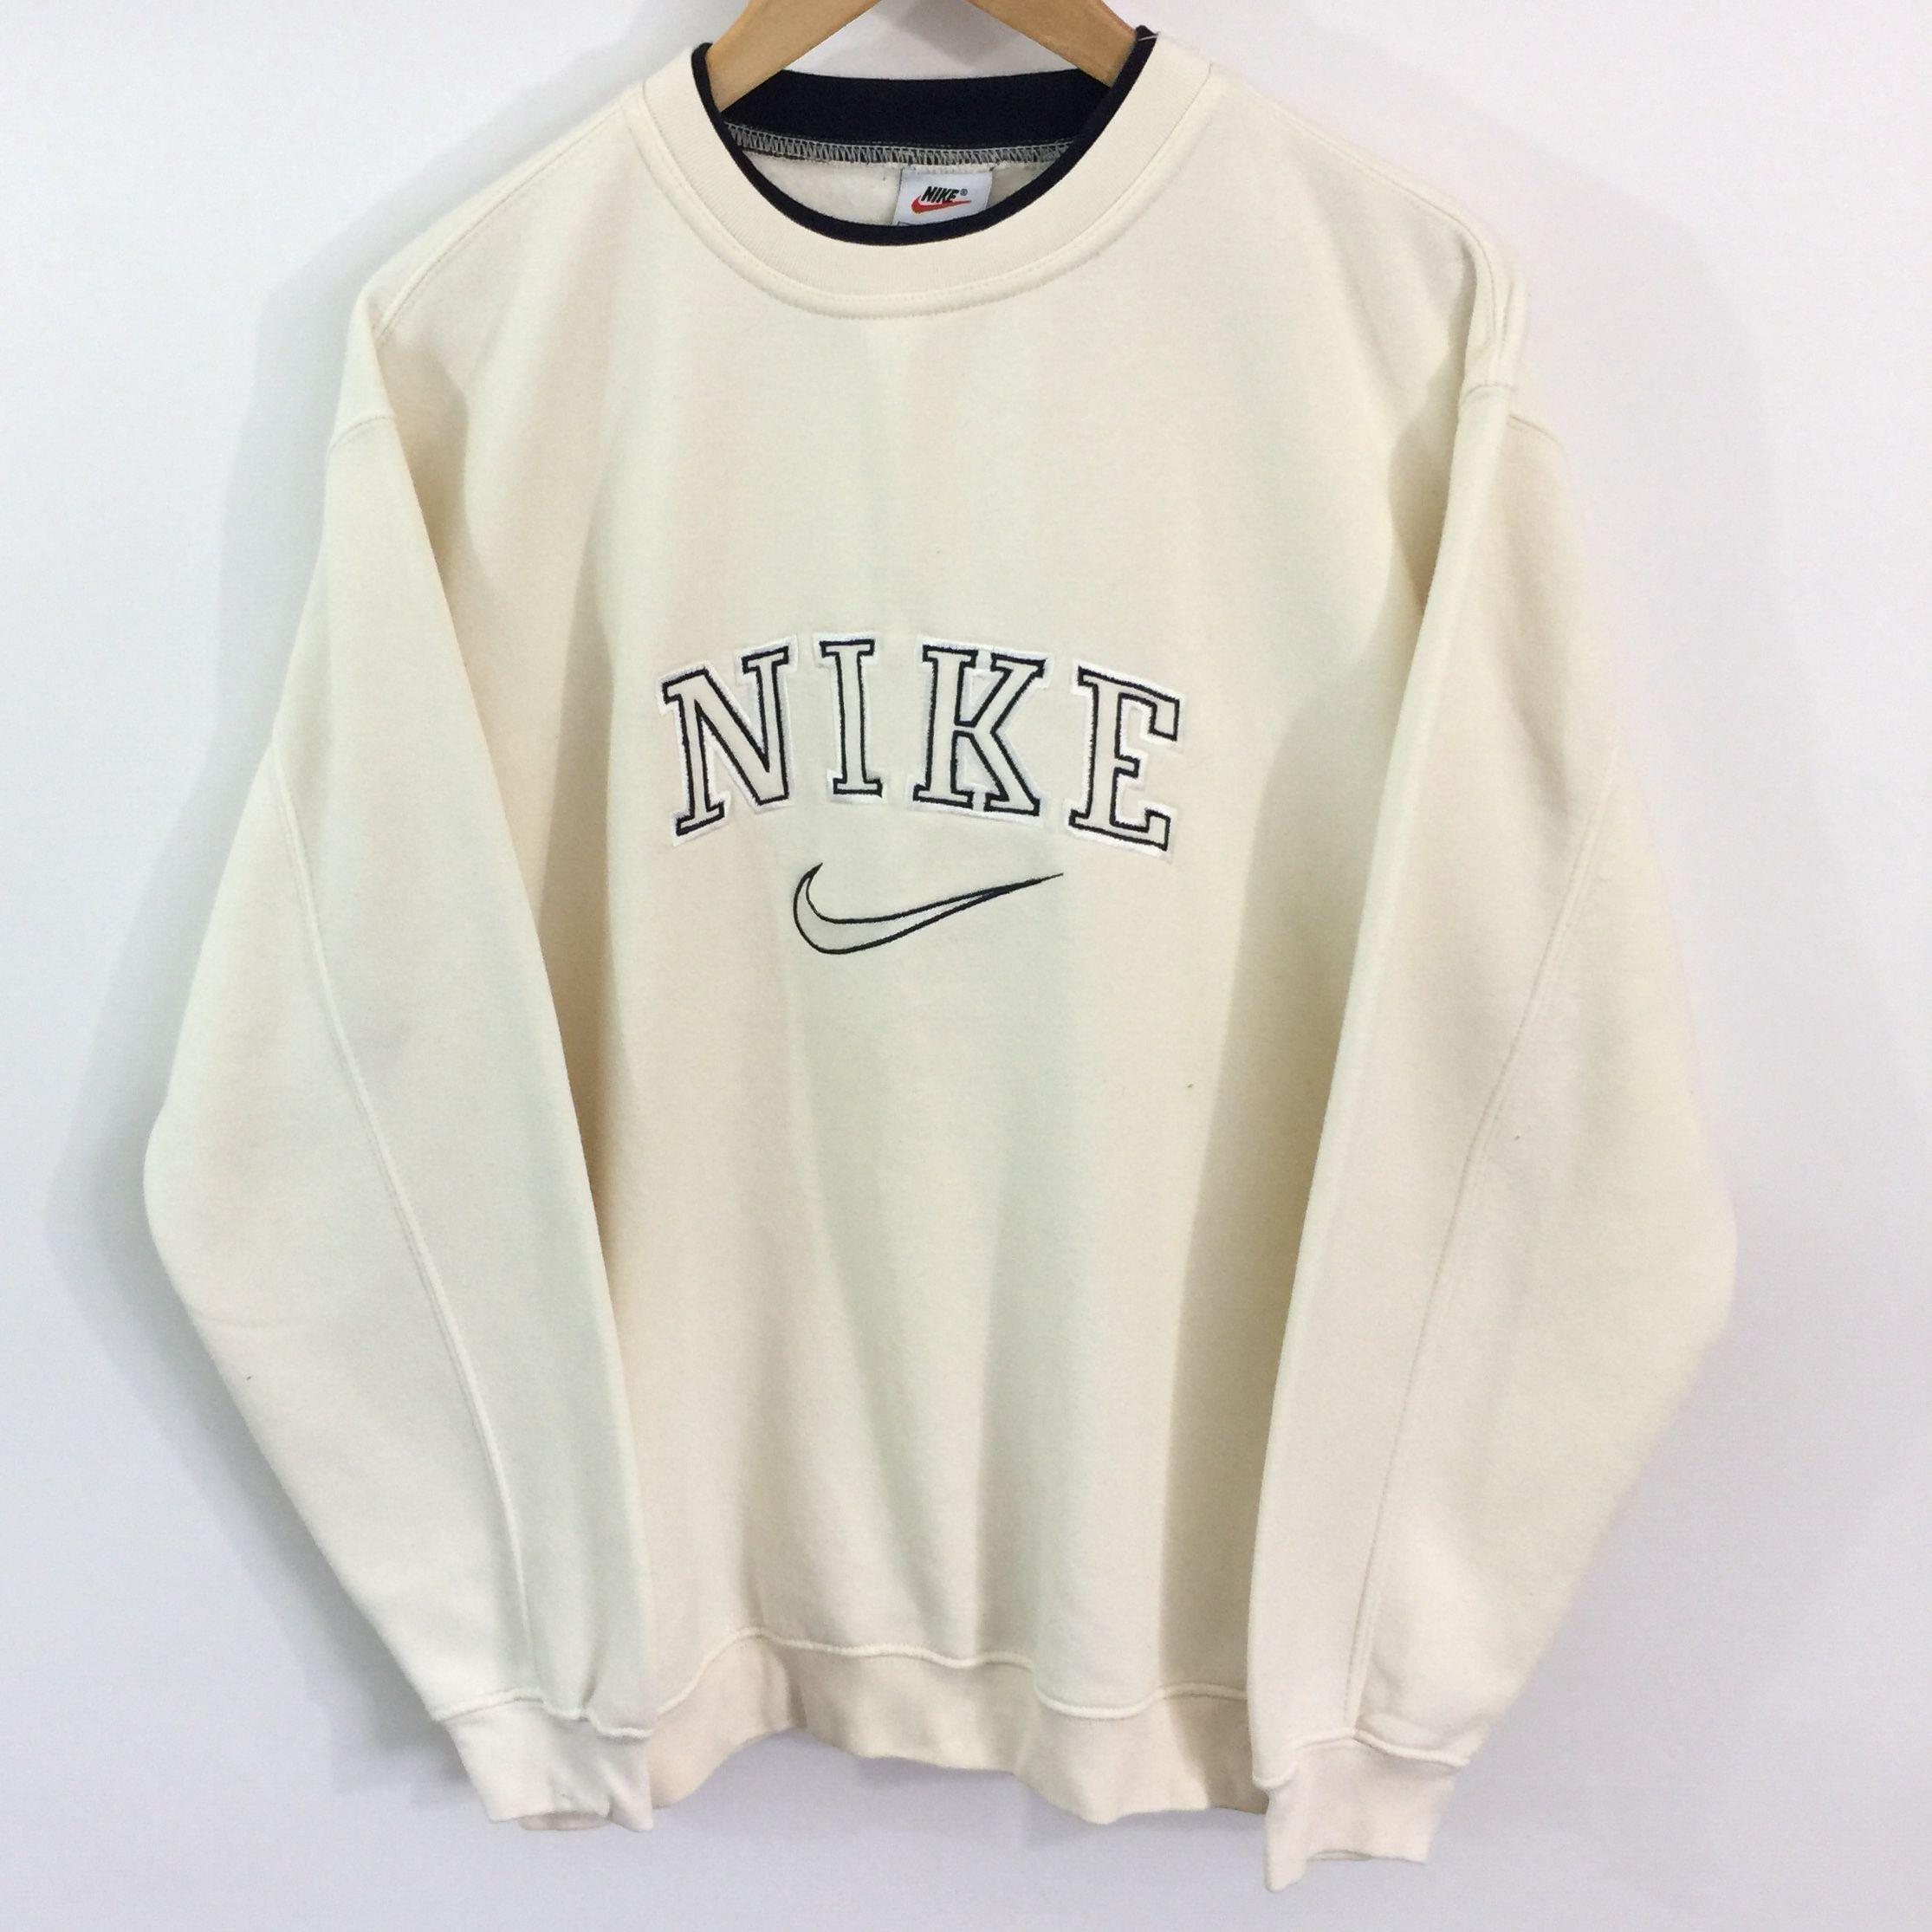 Vintage Nike Sweatshirt Label Size Medium Cream Depop In 2020 Vintage Nike Sweatshirt Vintage Hoodies Retro Outfits